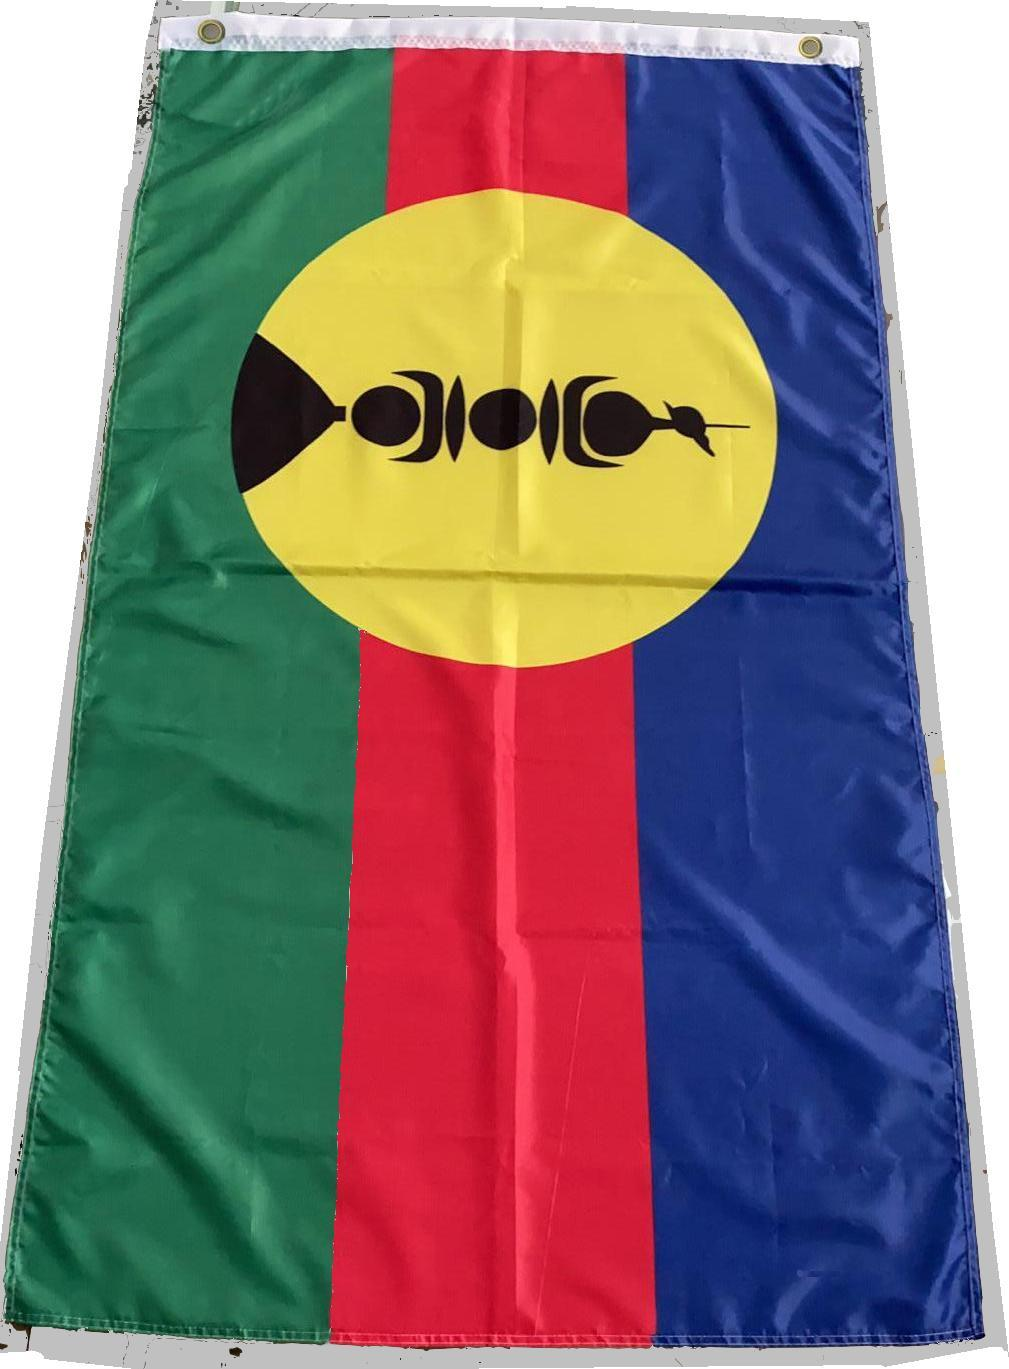 New flag sample1 07 21 good position